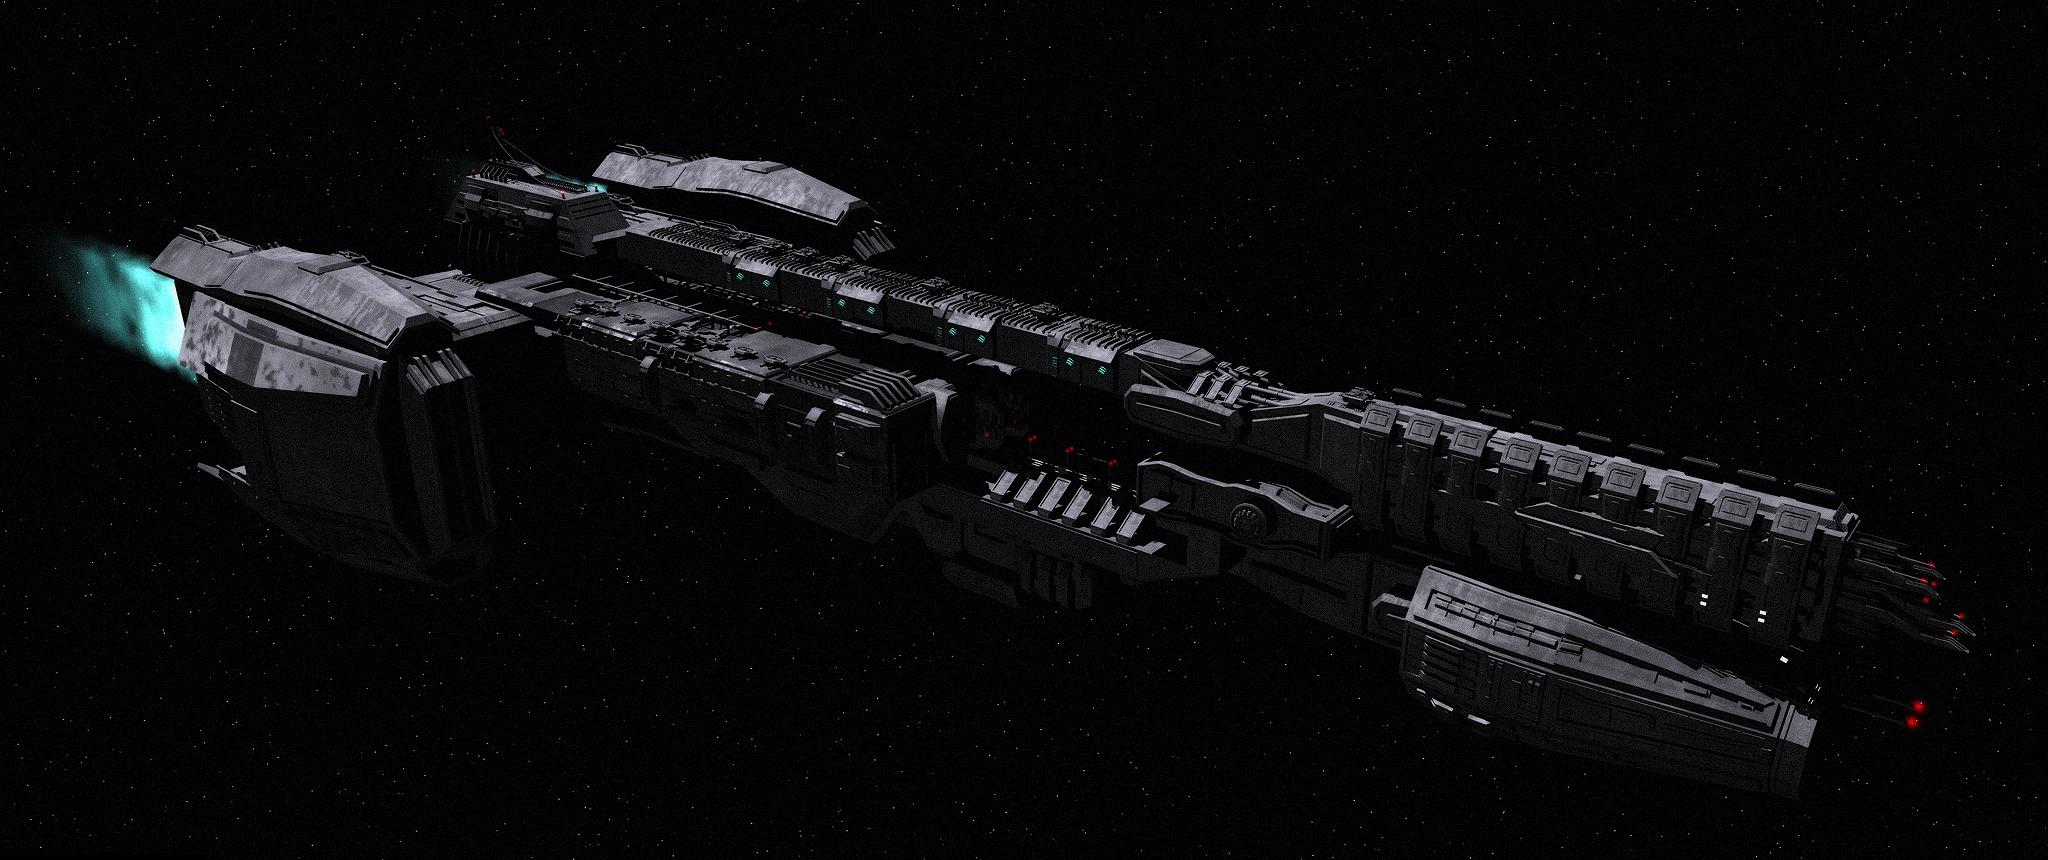 UNSC Apollo (Masterchief46517)